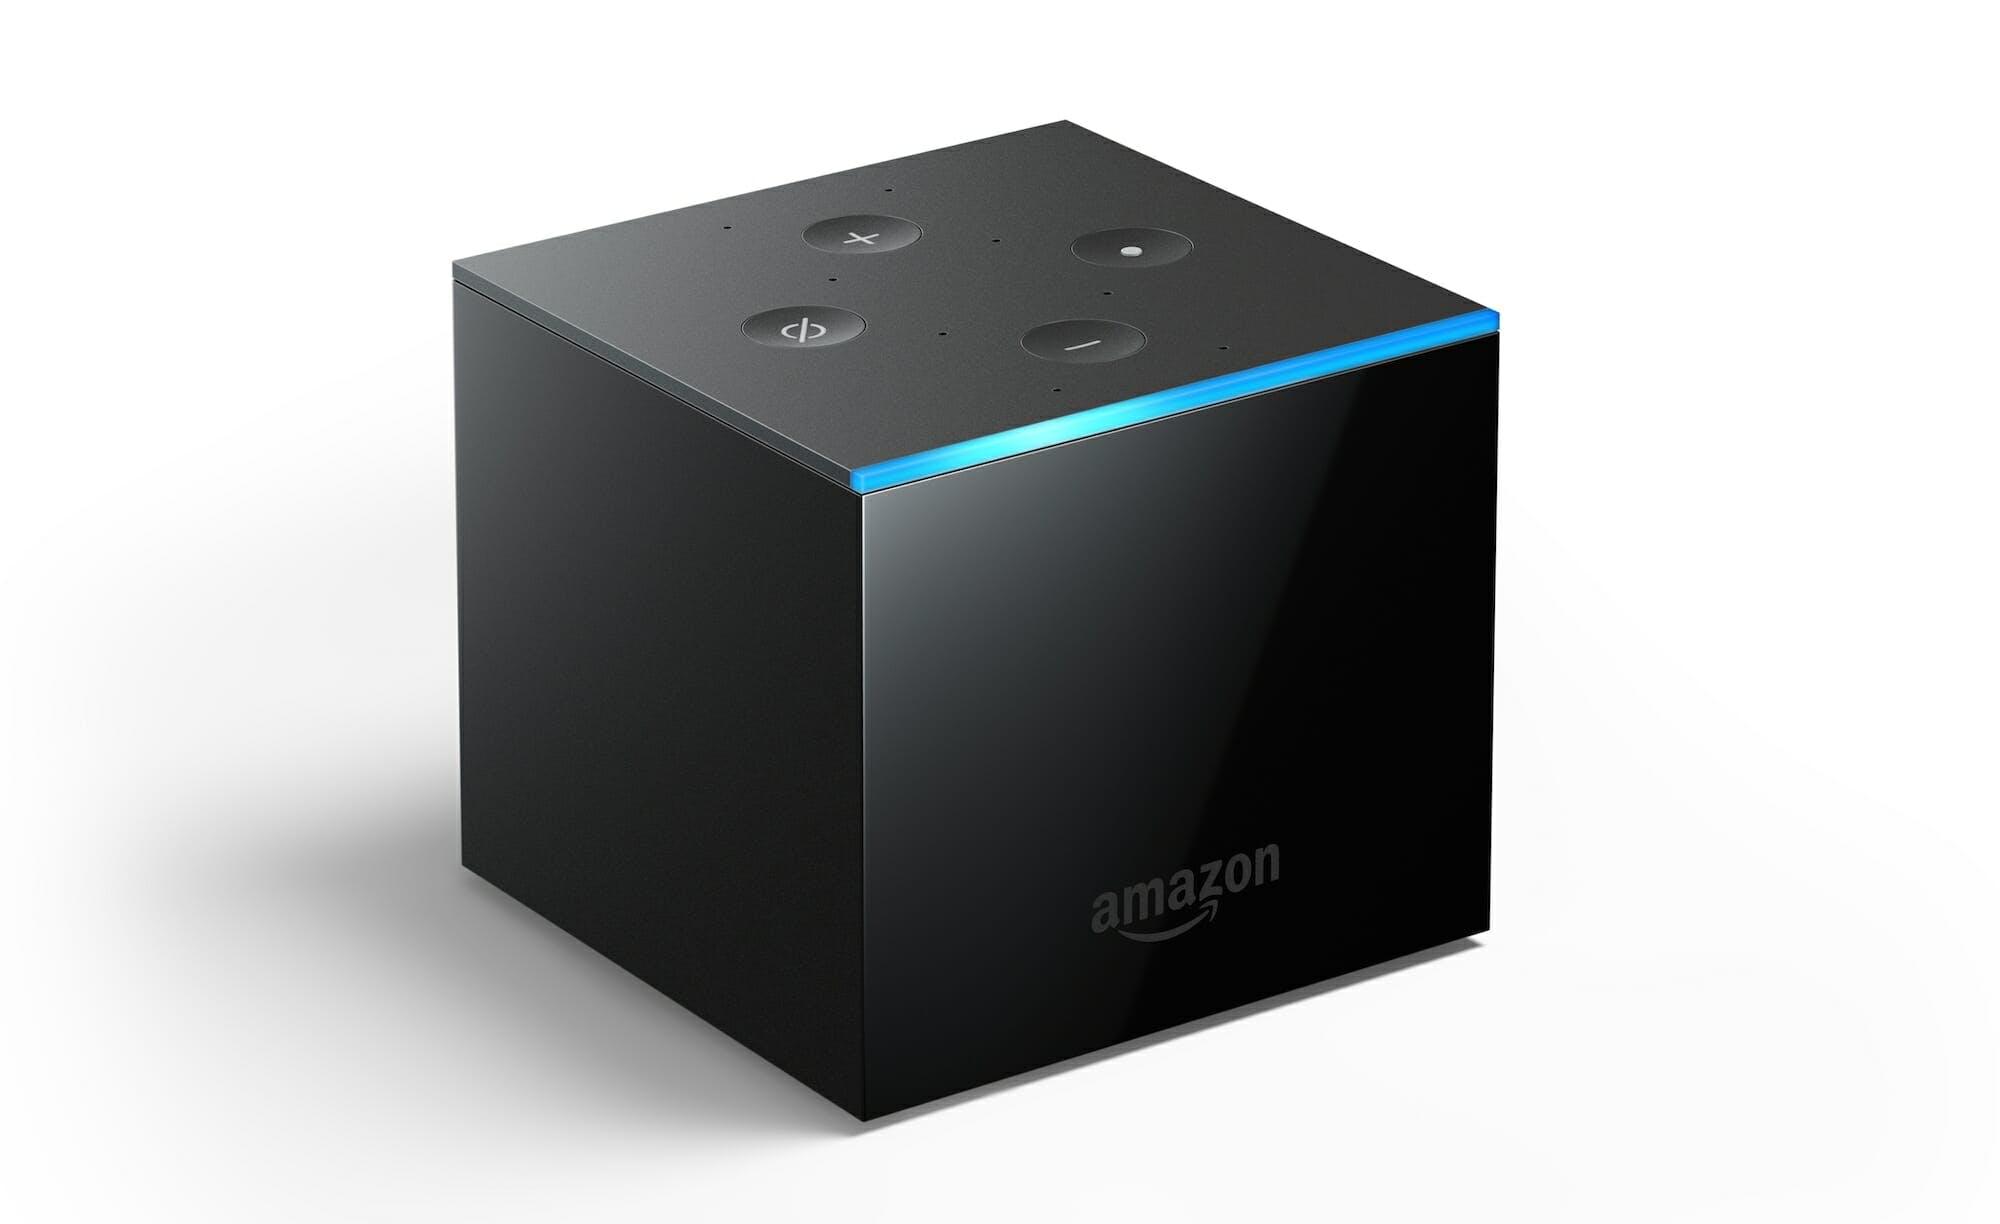 Amazon Fire TV Cube angle